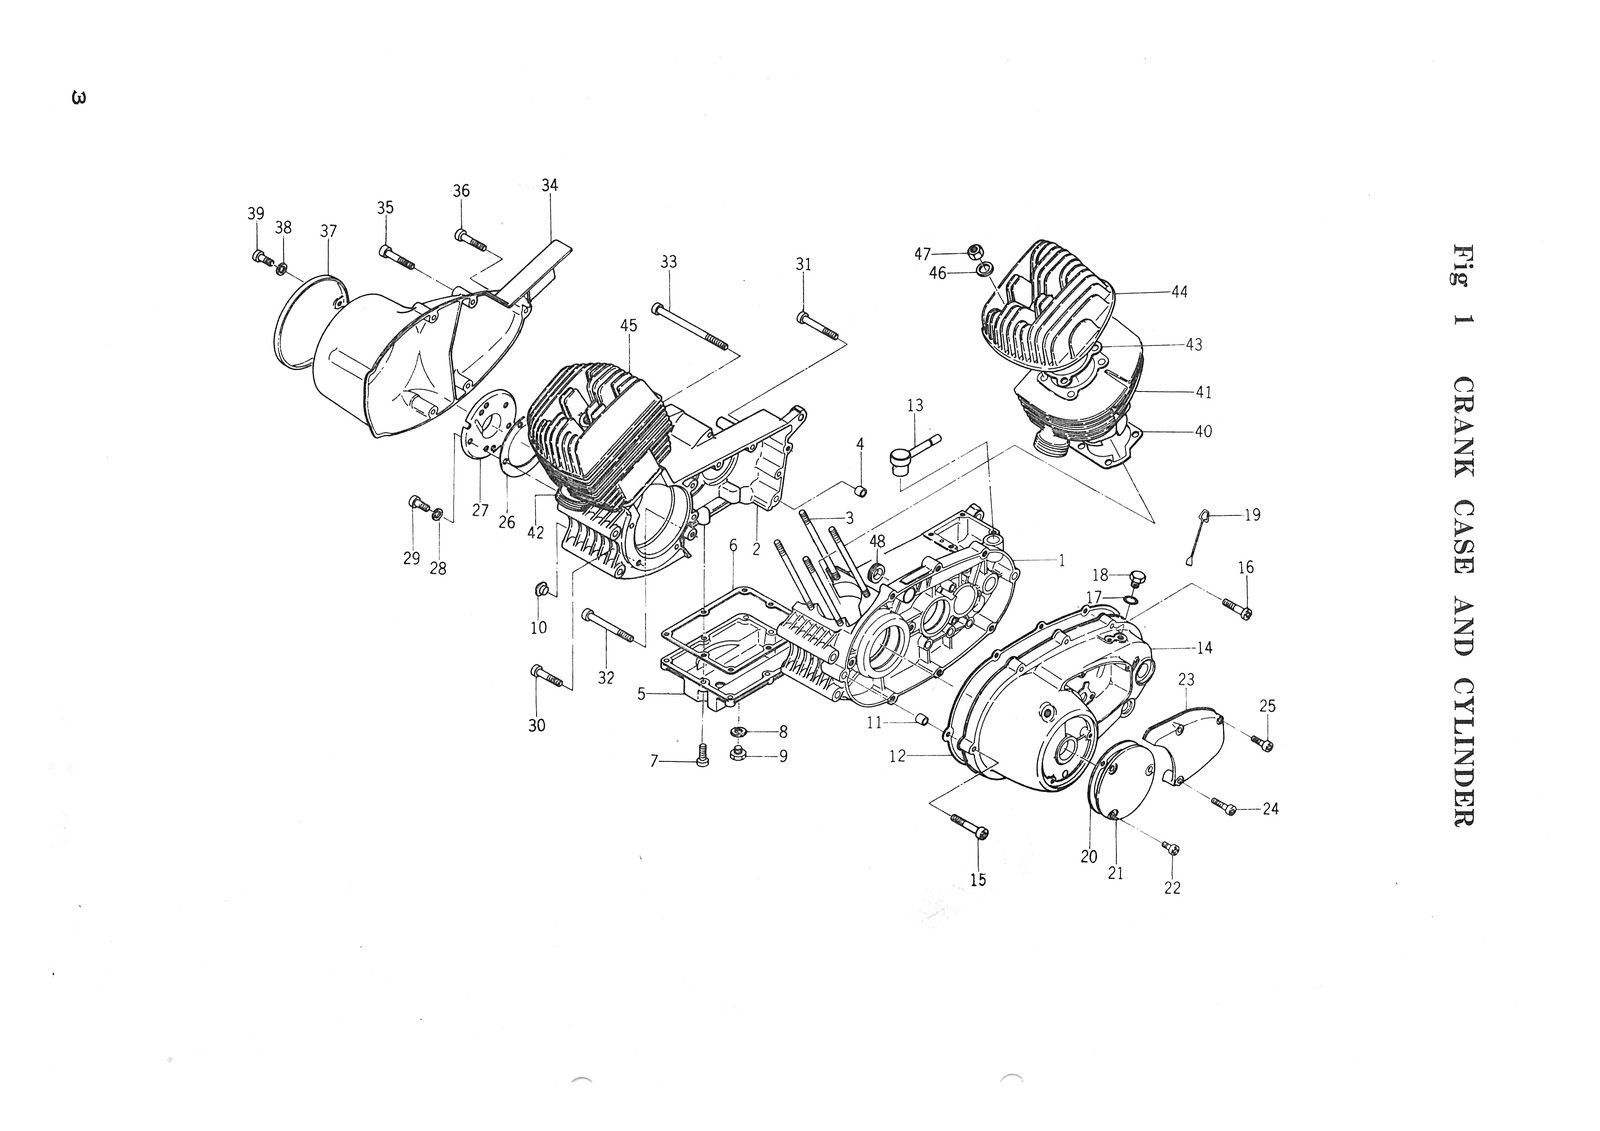 medium resolution of yamaha parts manual yds3 yds3c yds3 c 1964 1965 1966 spares catalog list ebay